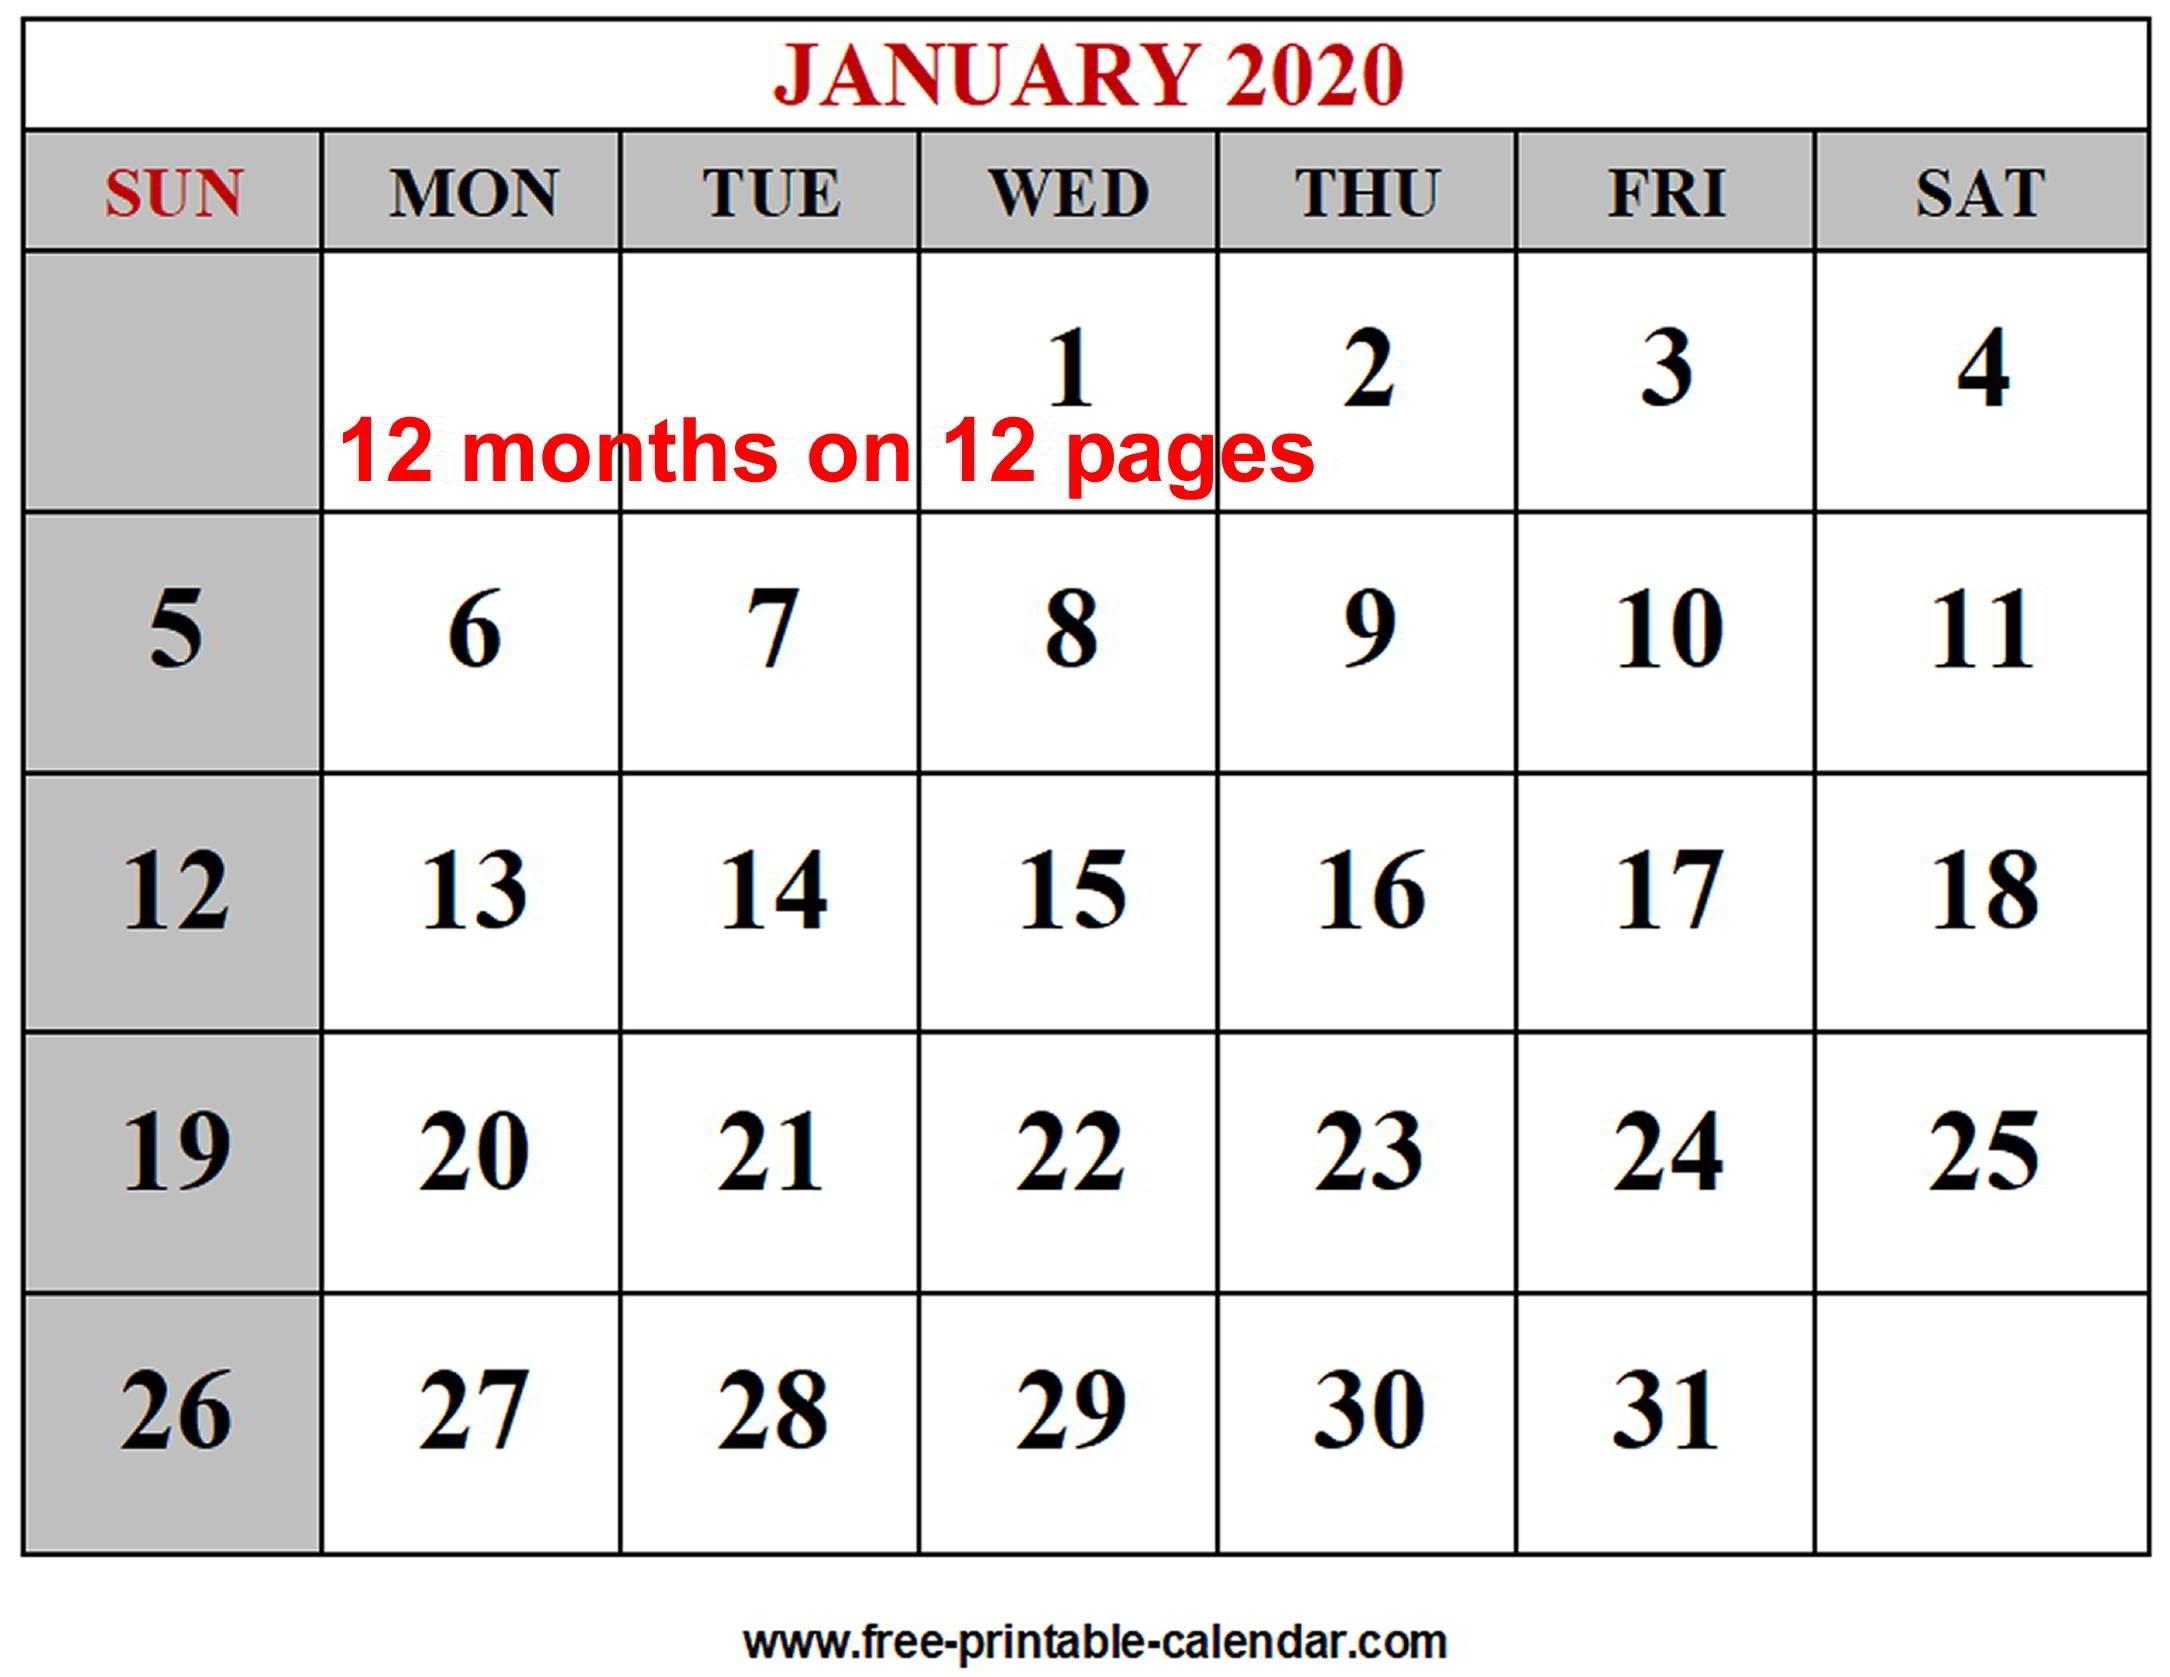 Year 2020 Calendar Templates - Free-Printable-Calendar throughout Download Free Printable 2020 Calendar